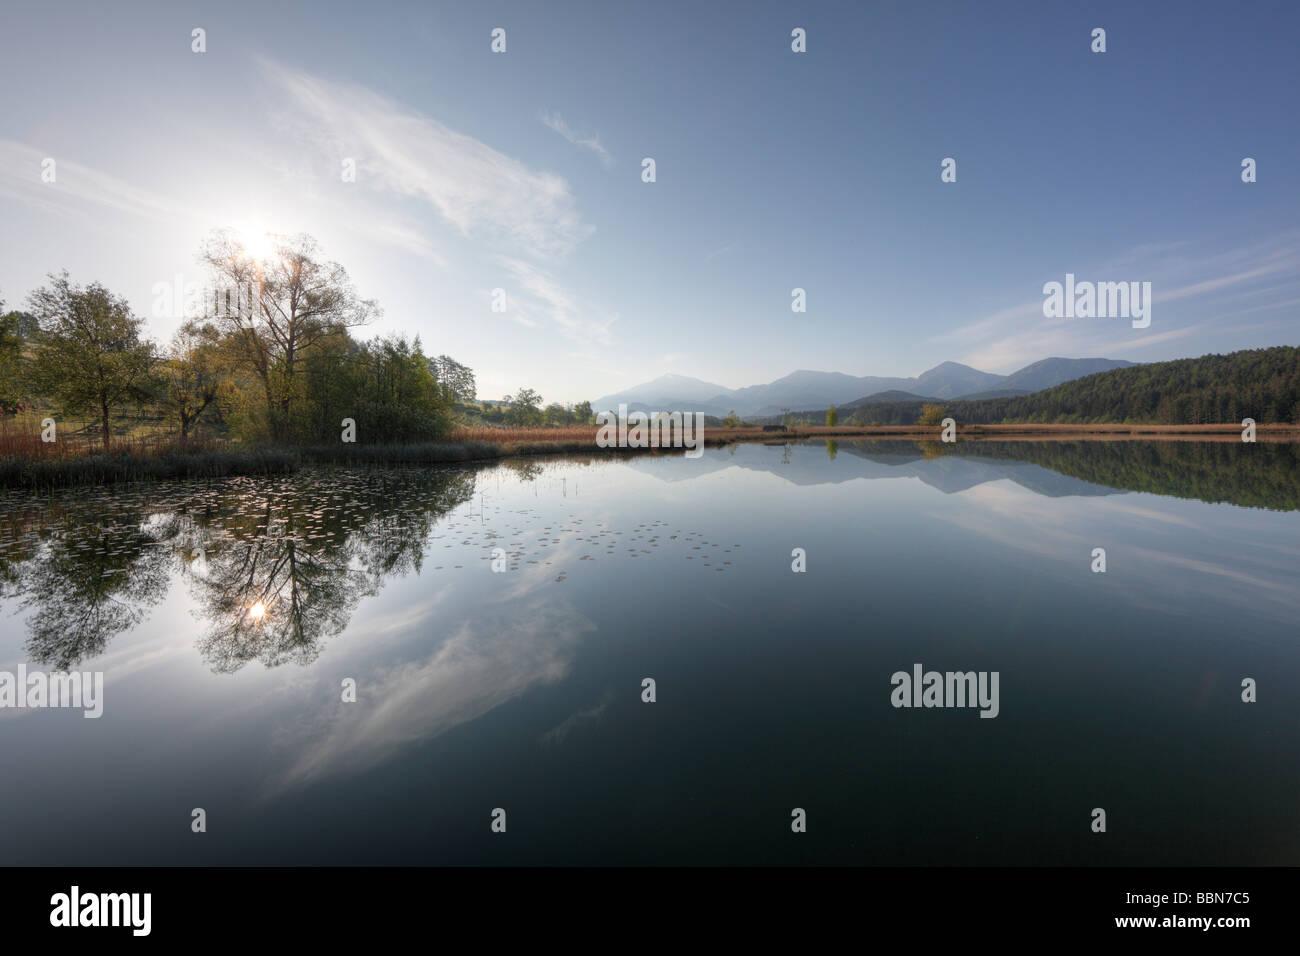 Turnersee lake, Carinthia, Austria, Europe Stock Photo